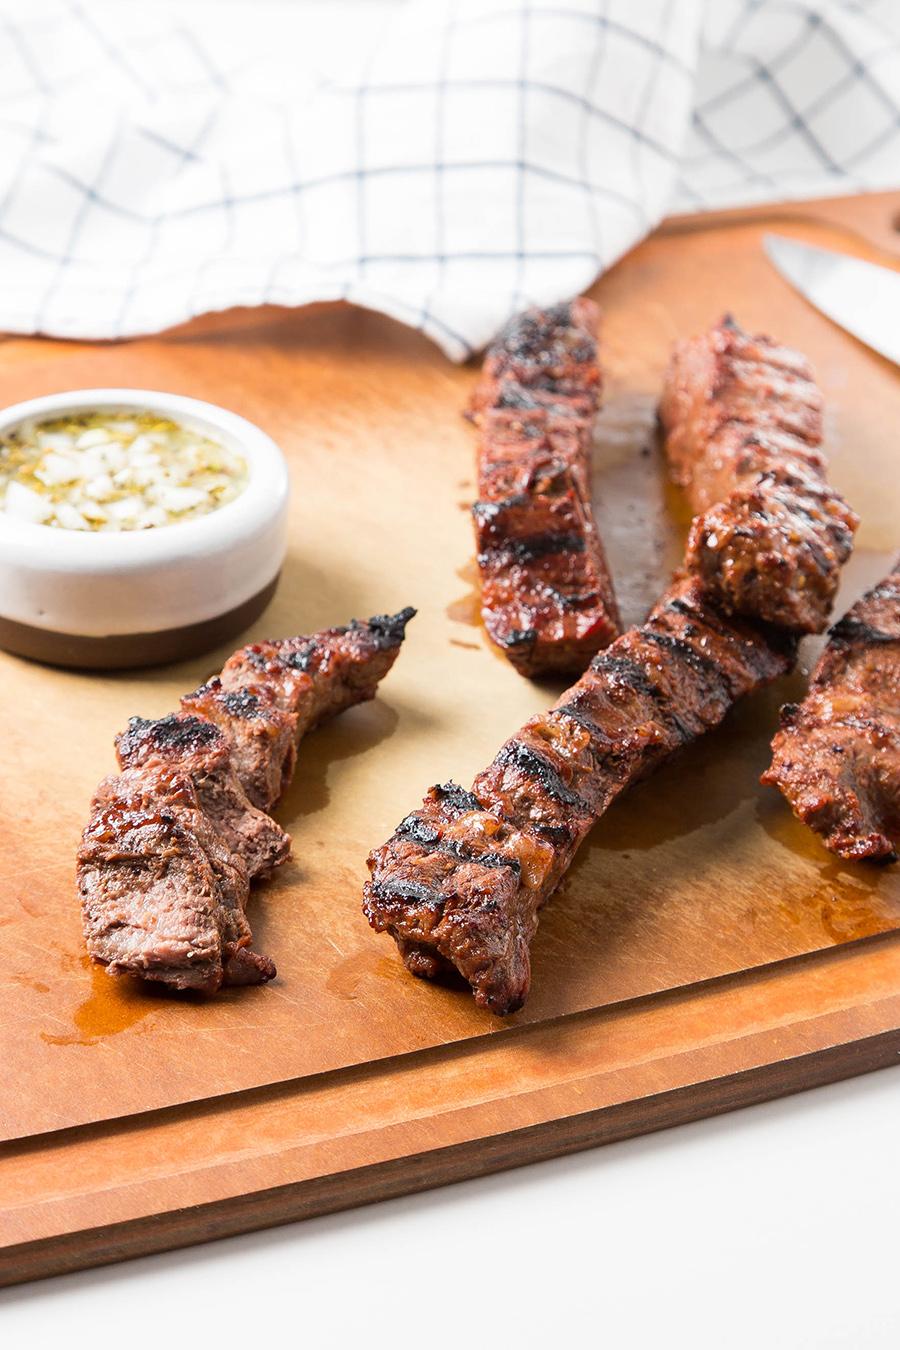 Grilled College Marinated Steaks #steak #marinade #grilling #meat #beer #chimol #dinner #dinnerrecipe #easyrecipe | The Missing Lokness